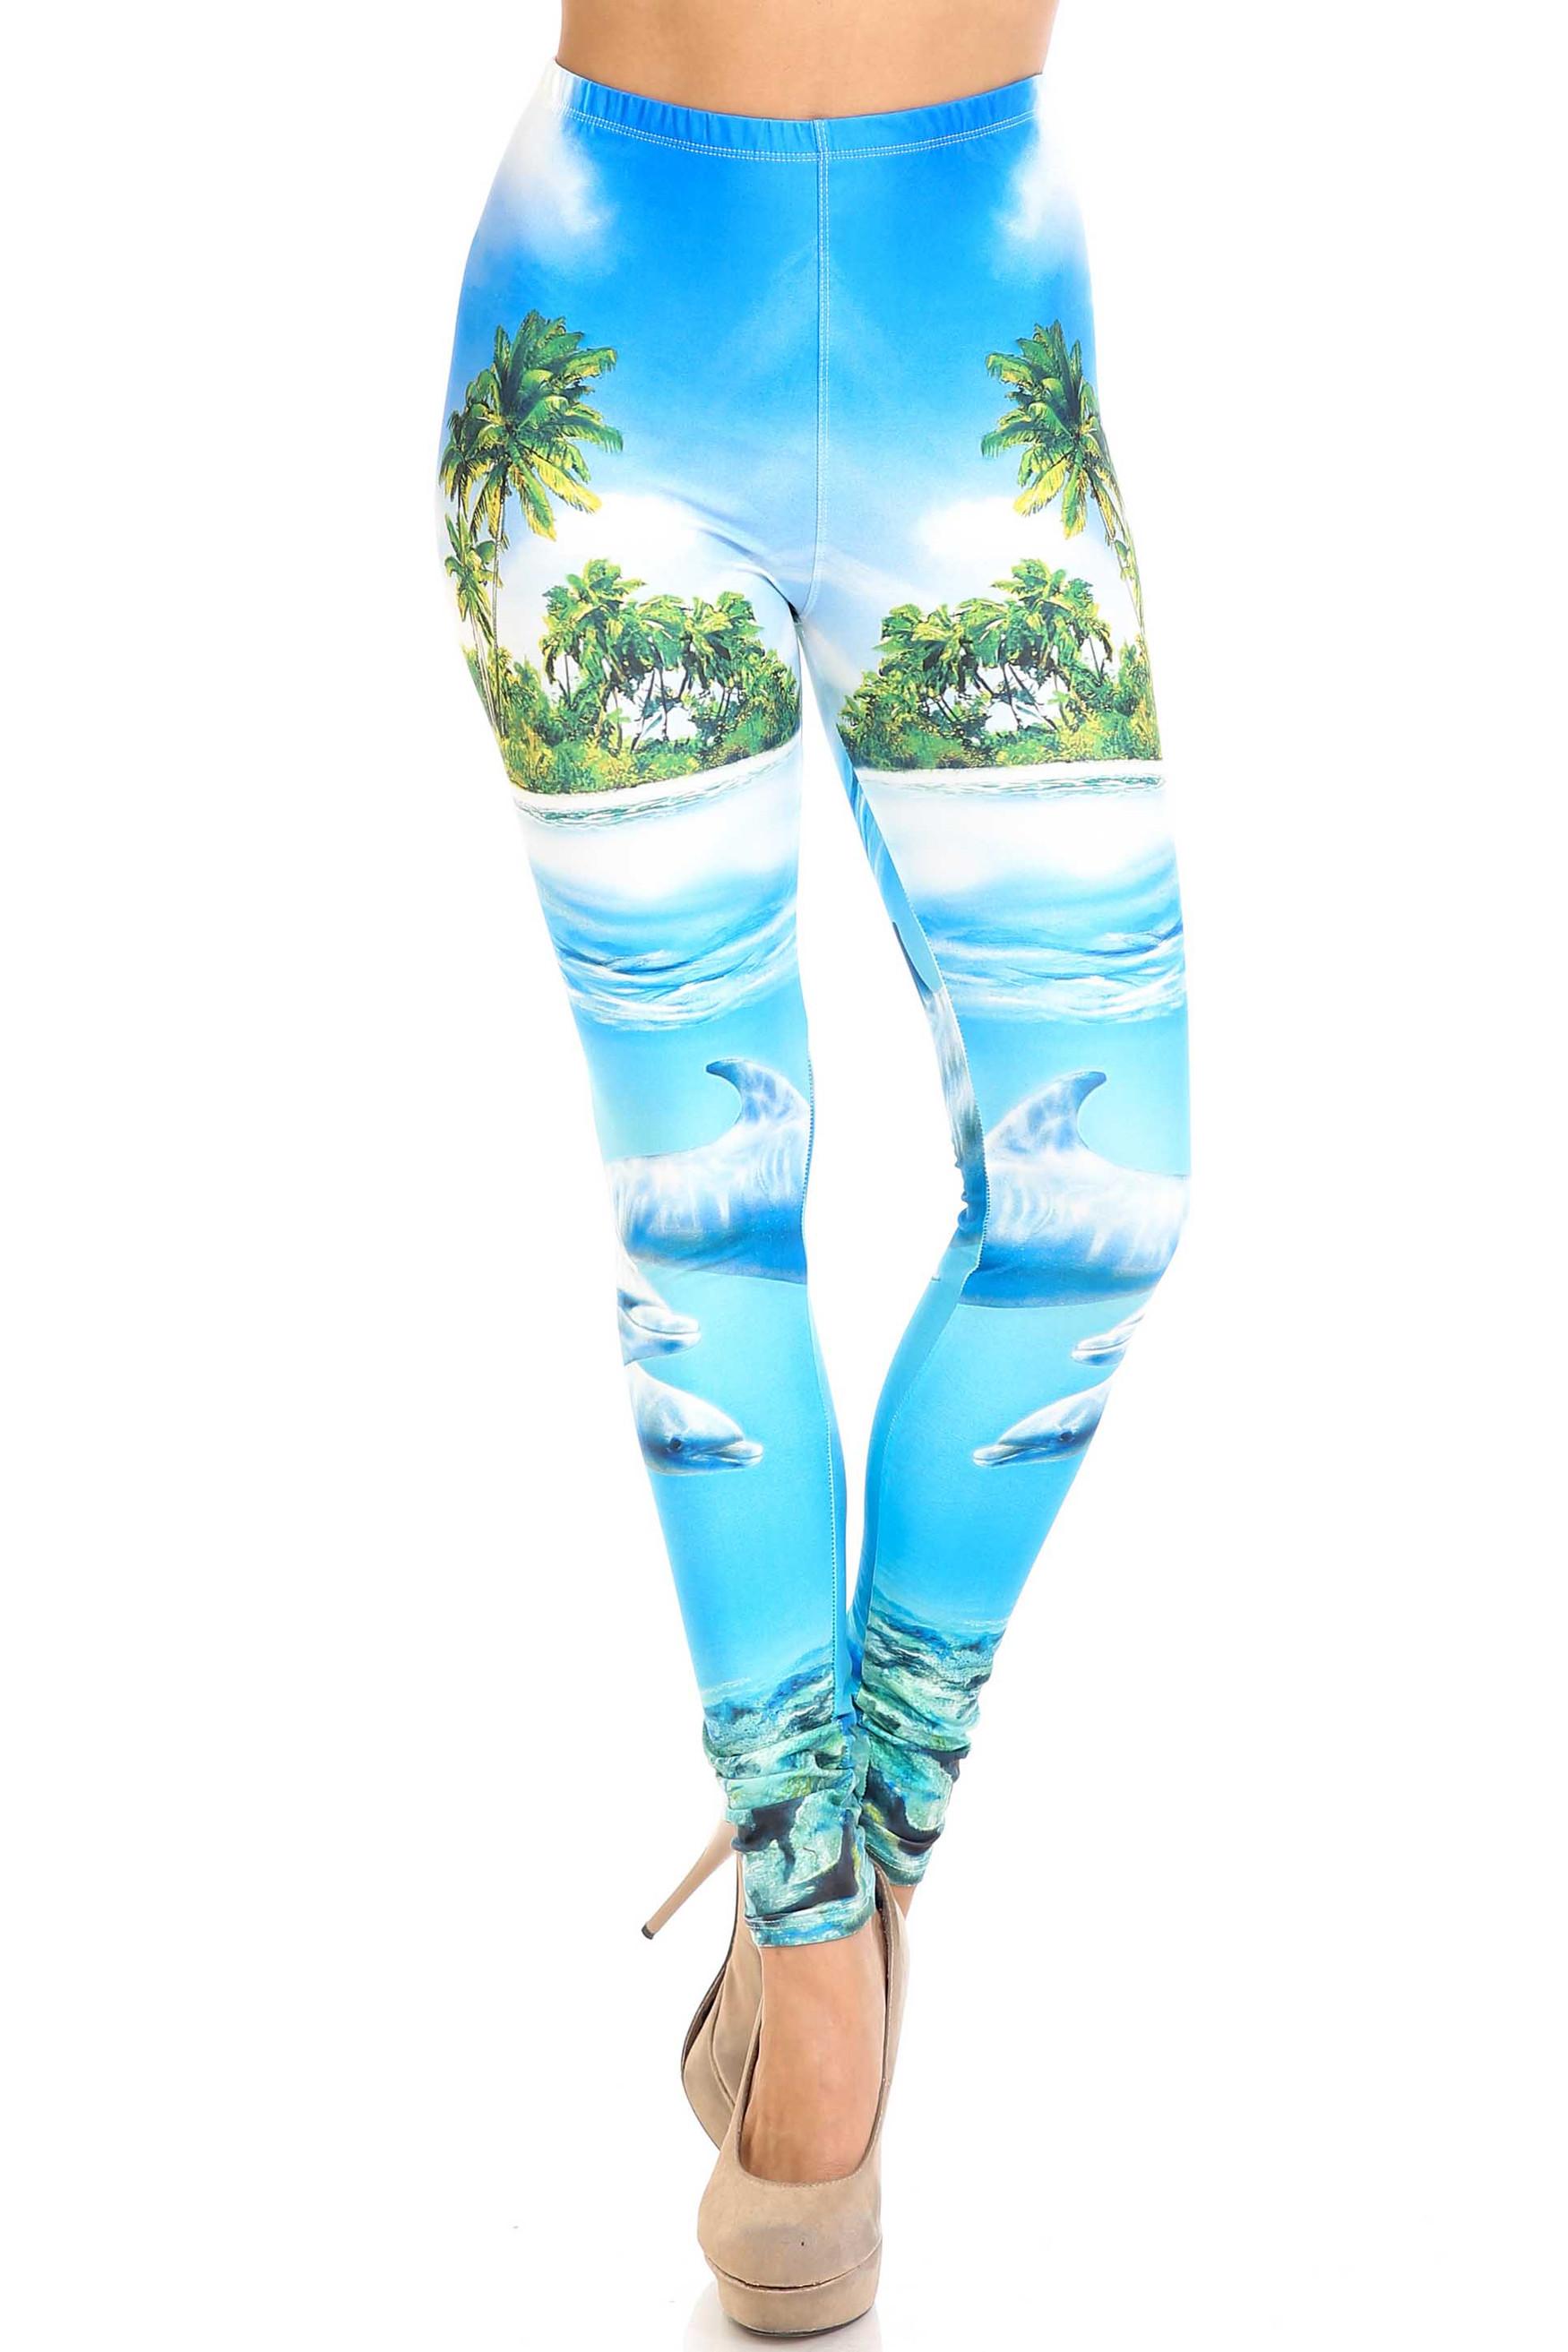 Creamy Soft Dolphin Paradise Extra Plus Size Leggings - 3X-5X - By USA Fashion™